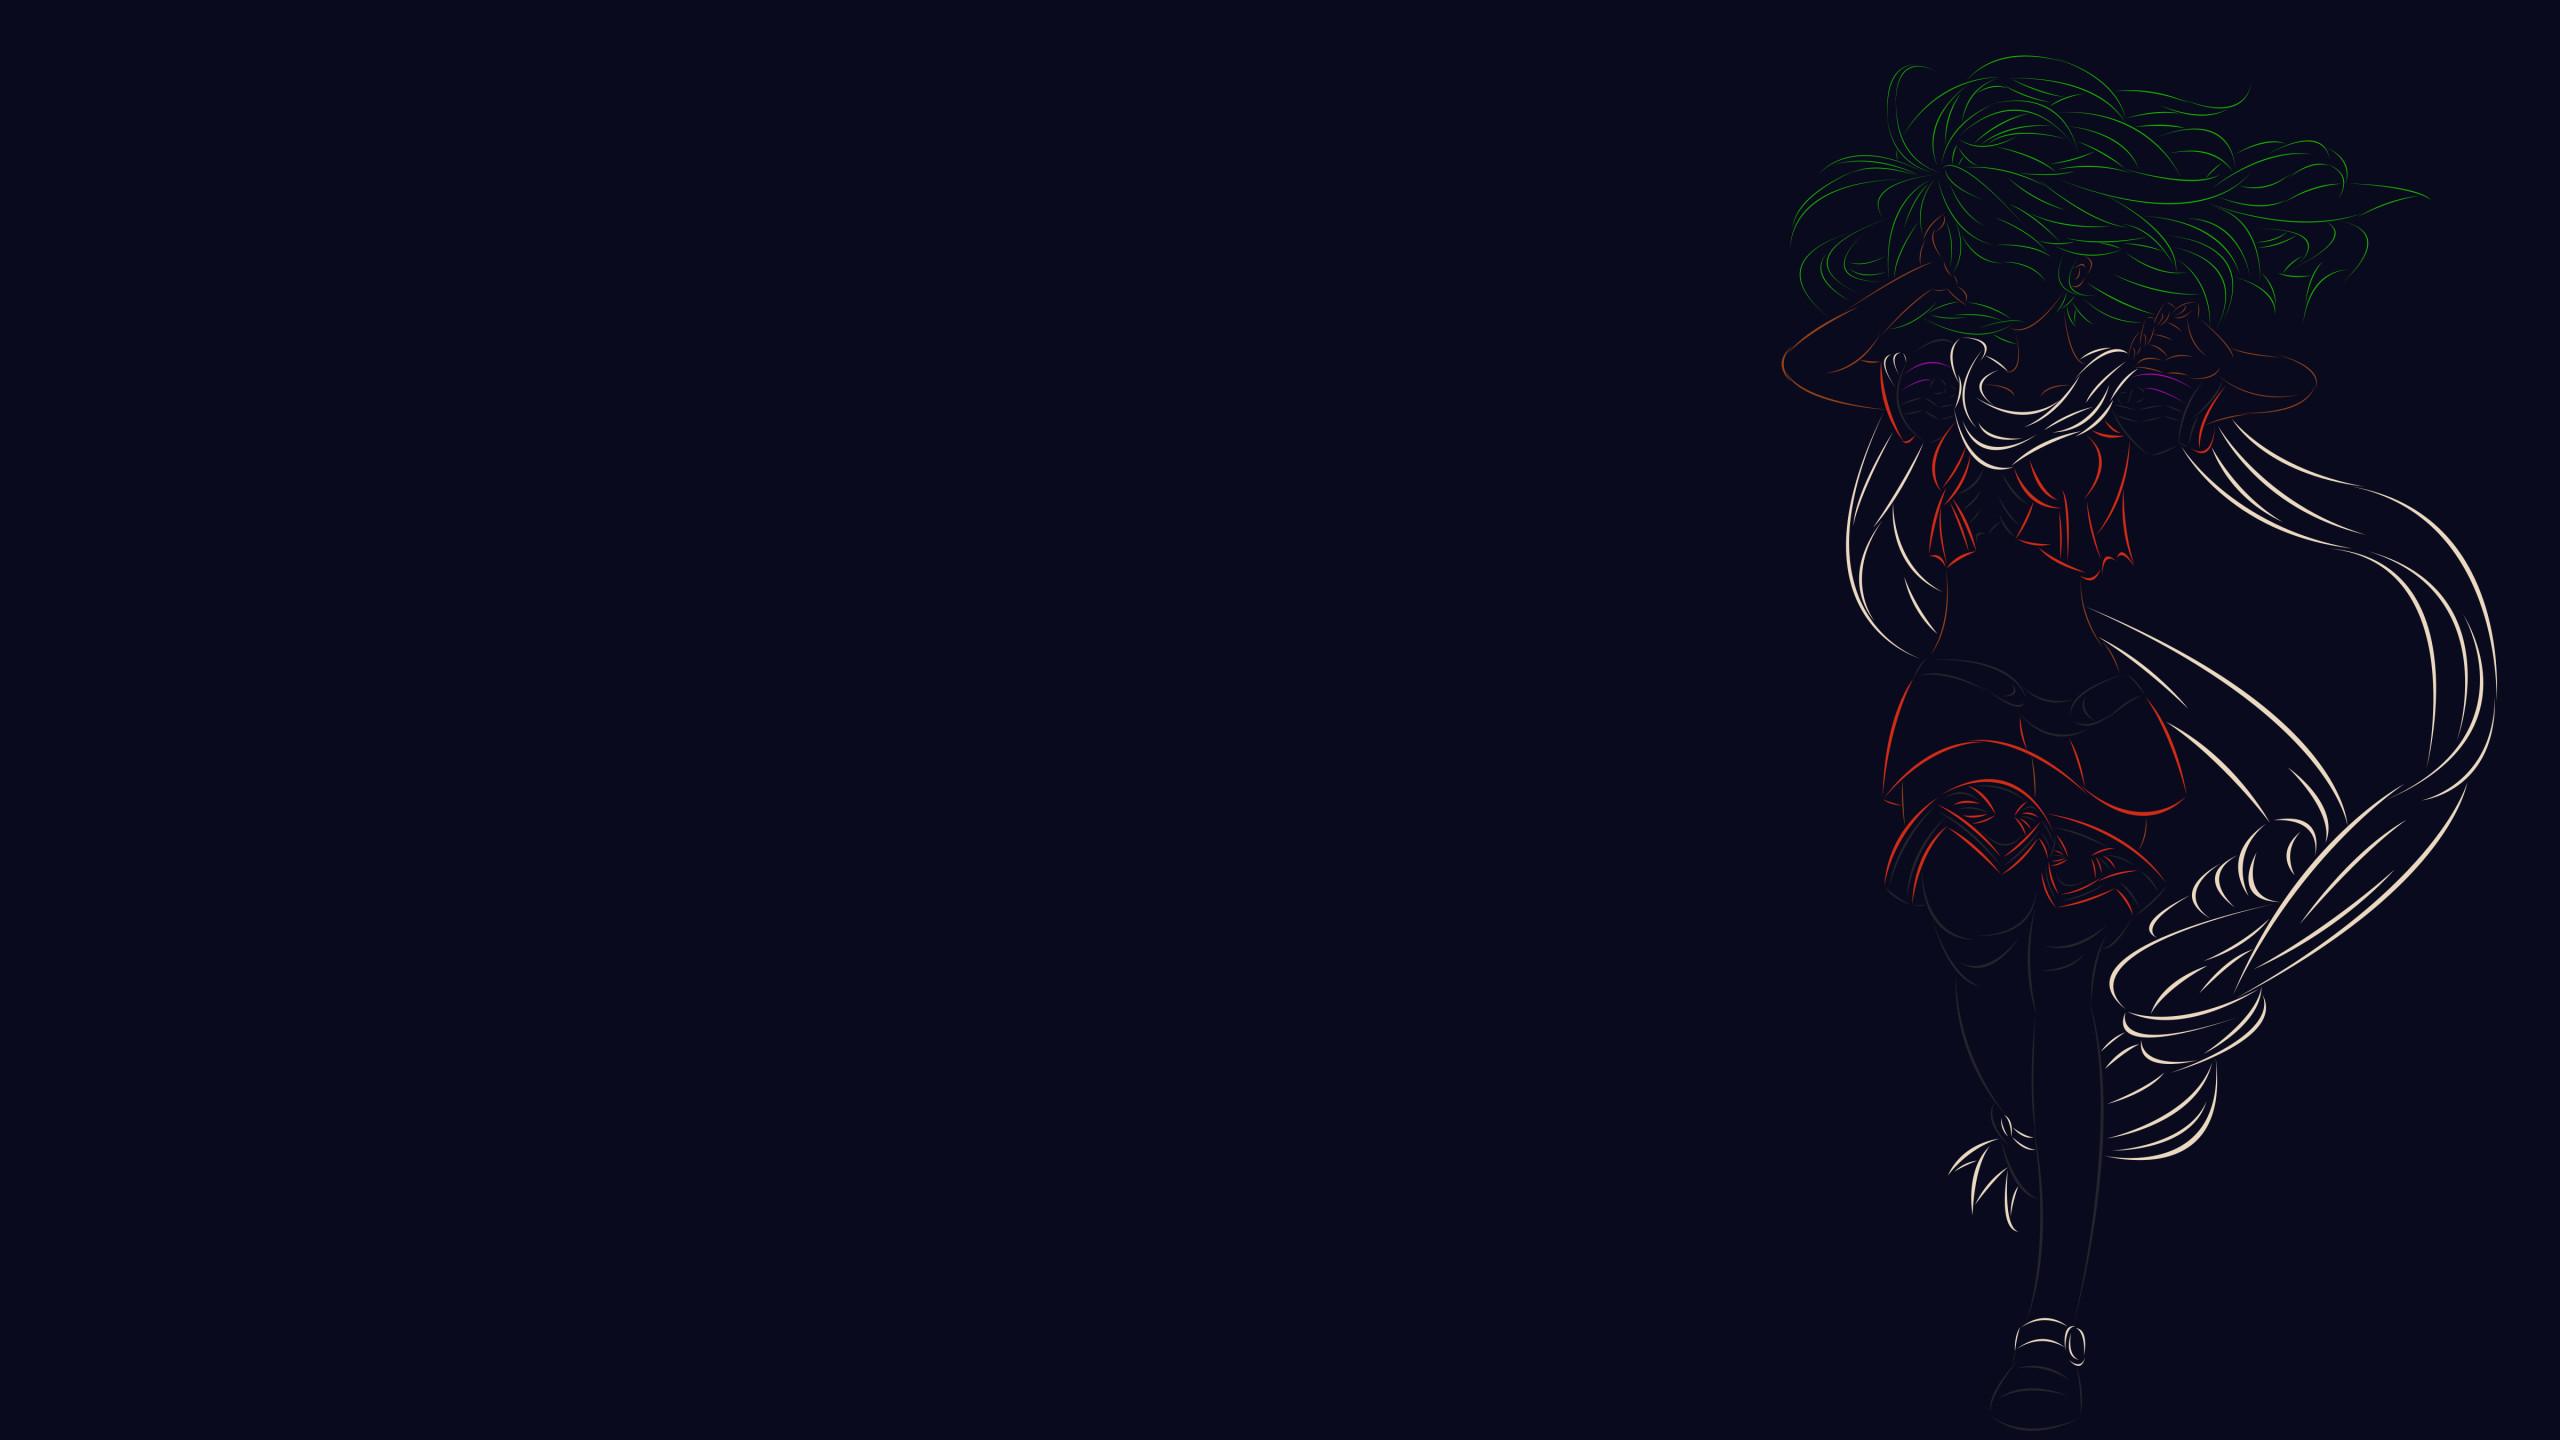 Xenogears – Emeralda wallpaper by Carionto Xenogears – Emeralda wallpaper  by Carionto